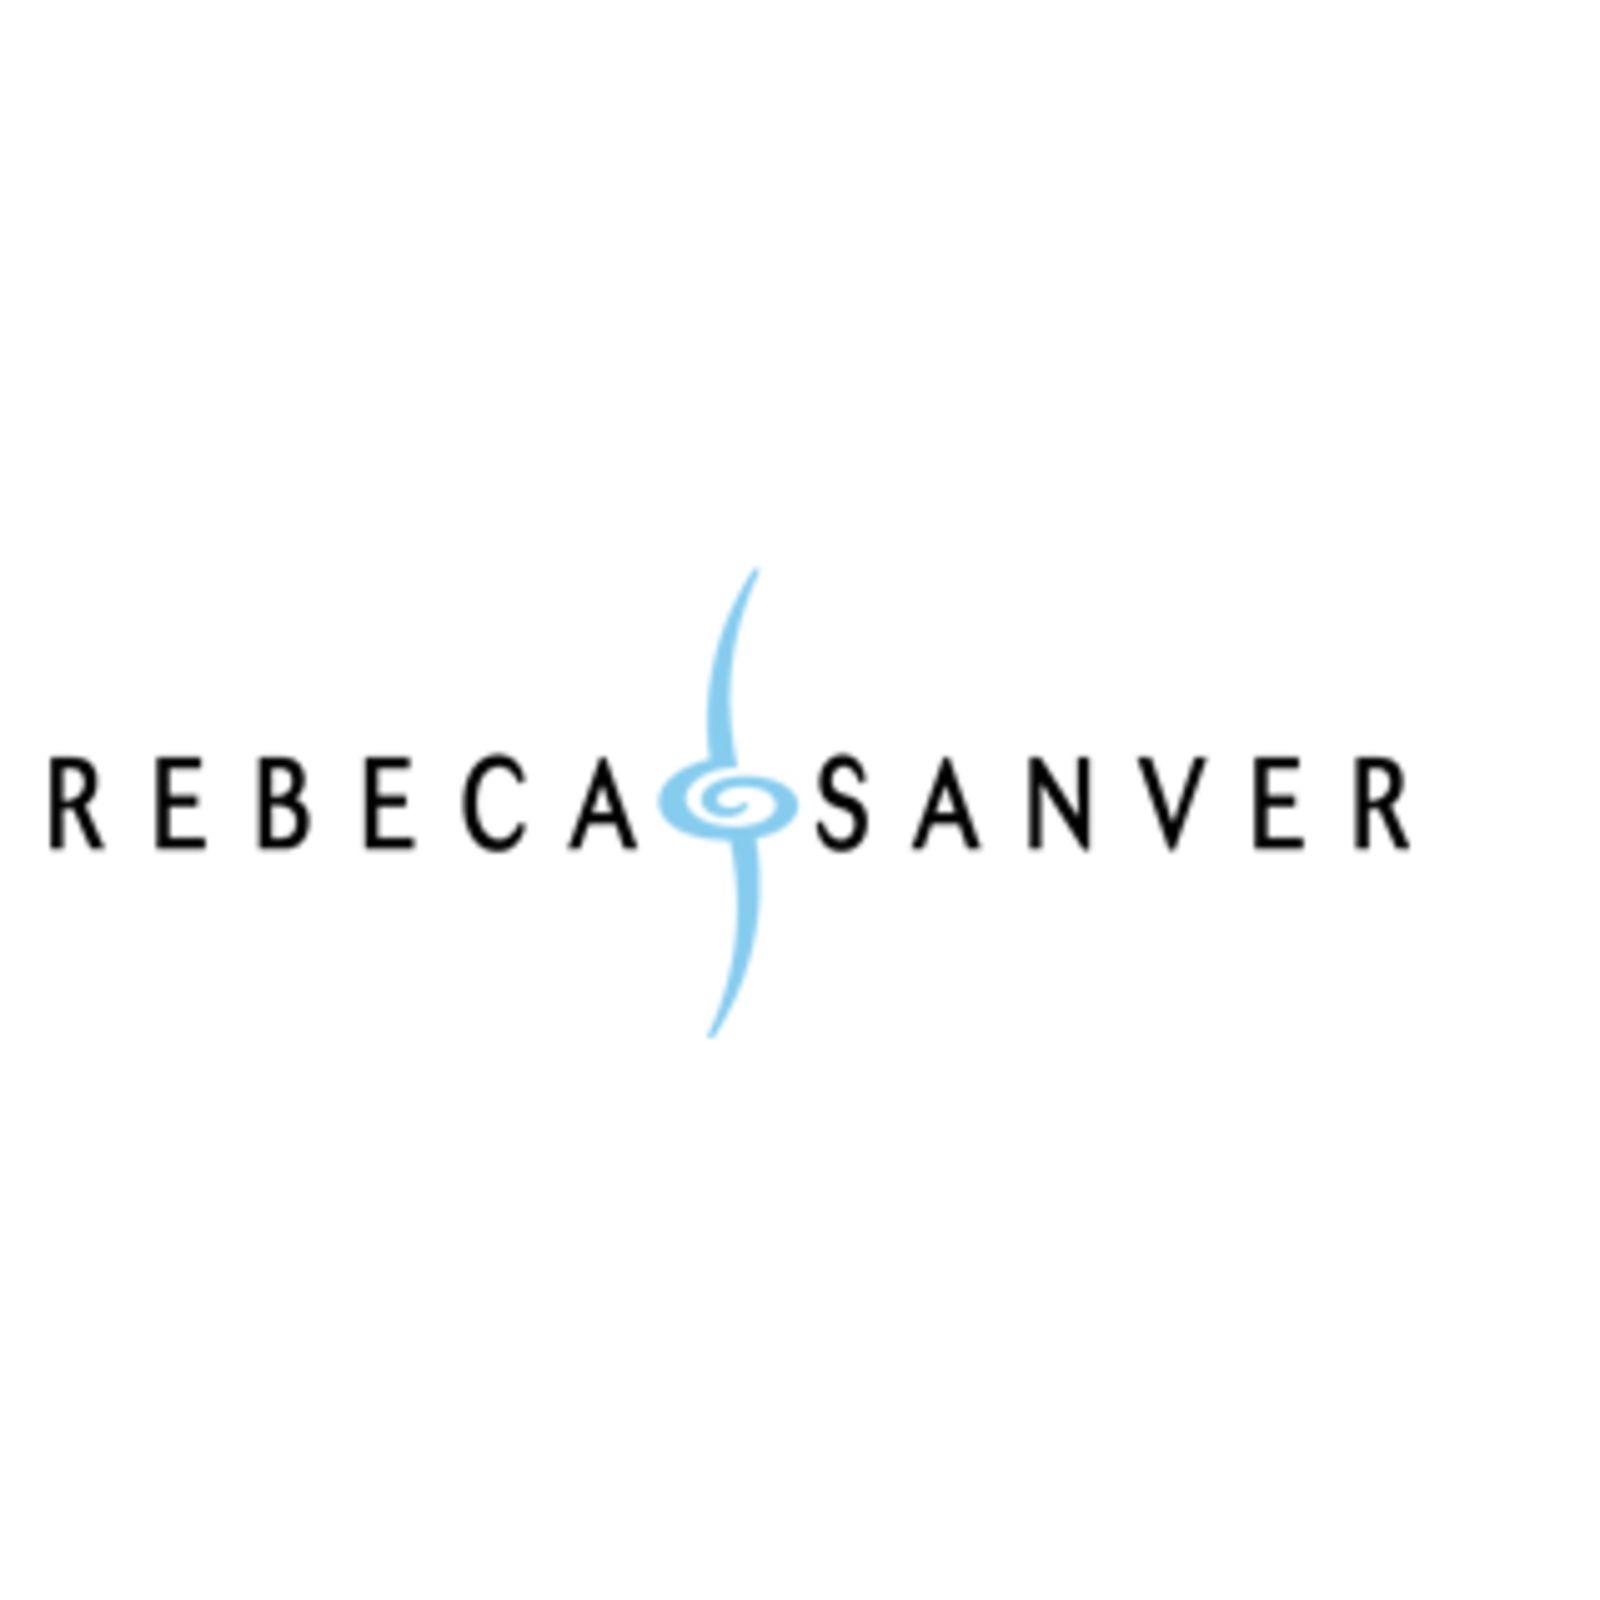 REBECA SANVER